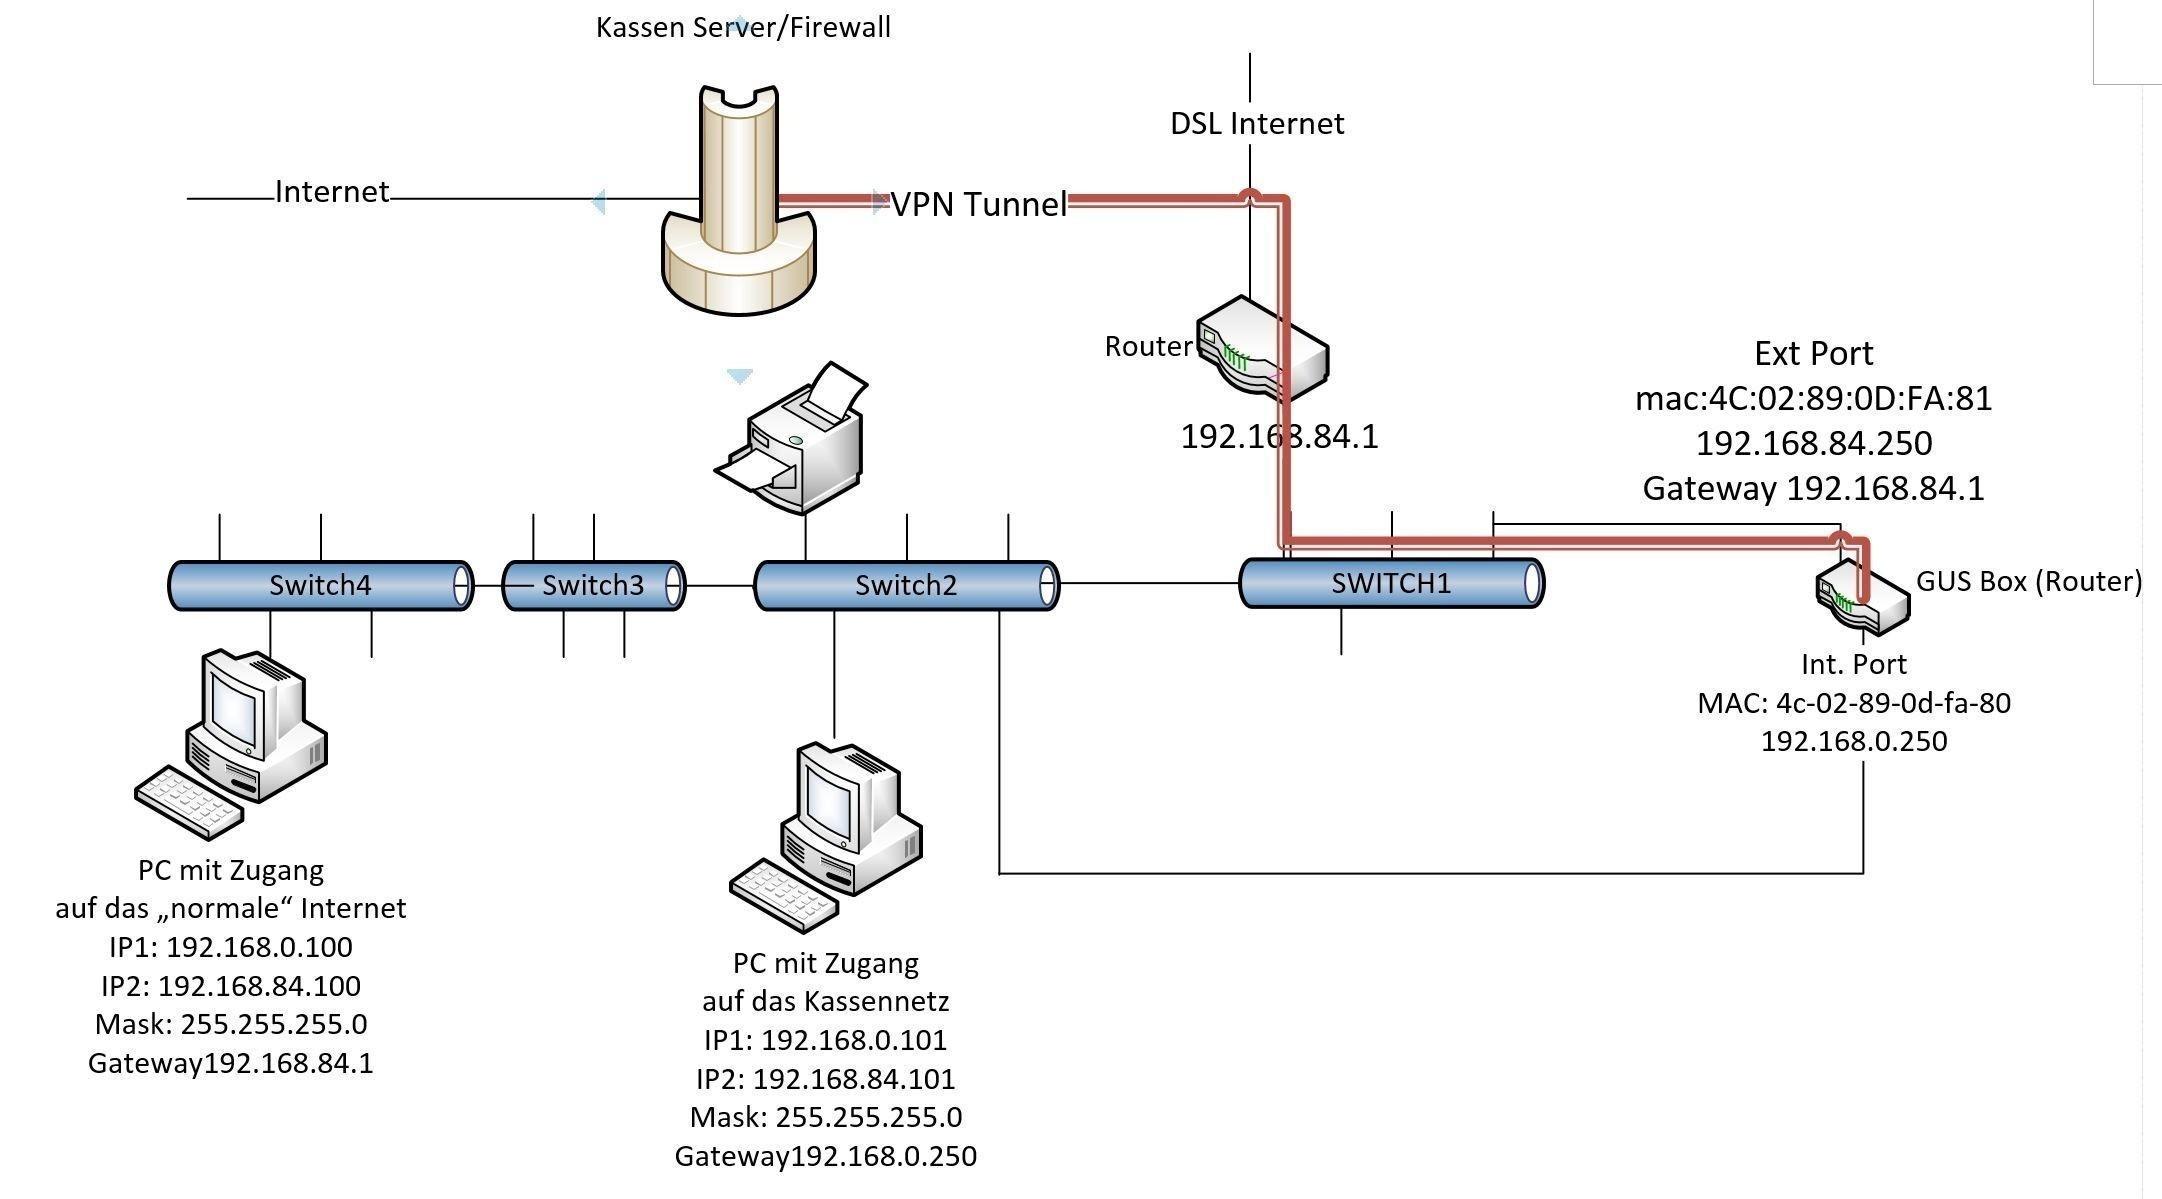 Engine Layout Diagram Electric Motor Wiring Diagram Symbols Inspirationa Generator Output Of Engine Layout Diagram